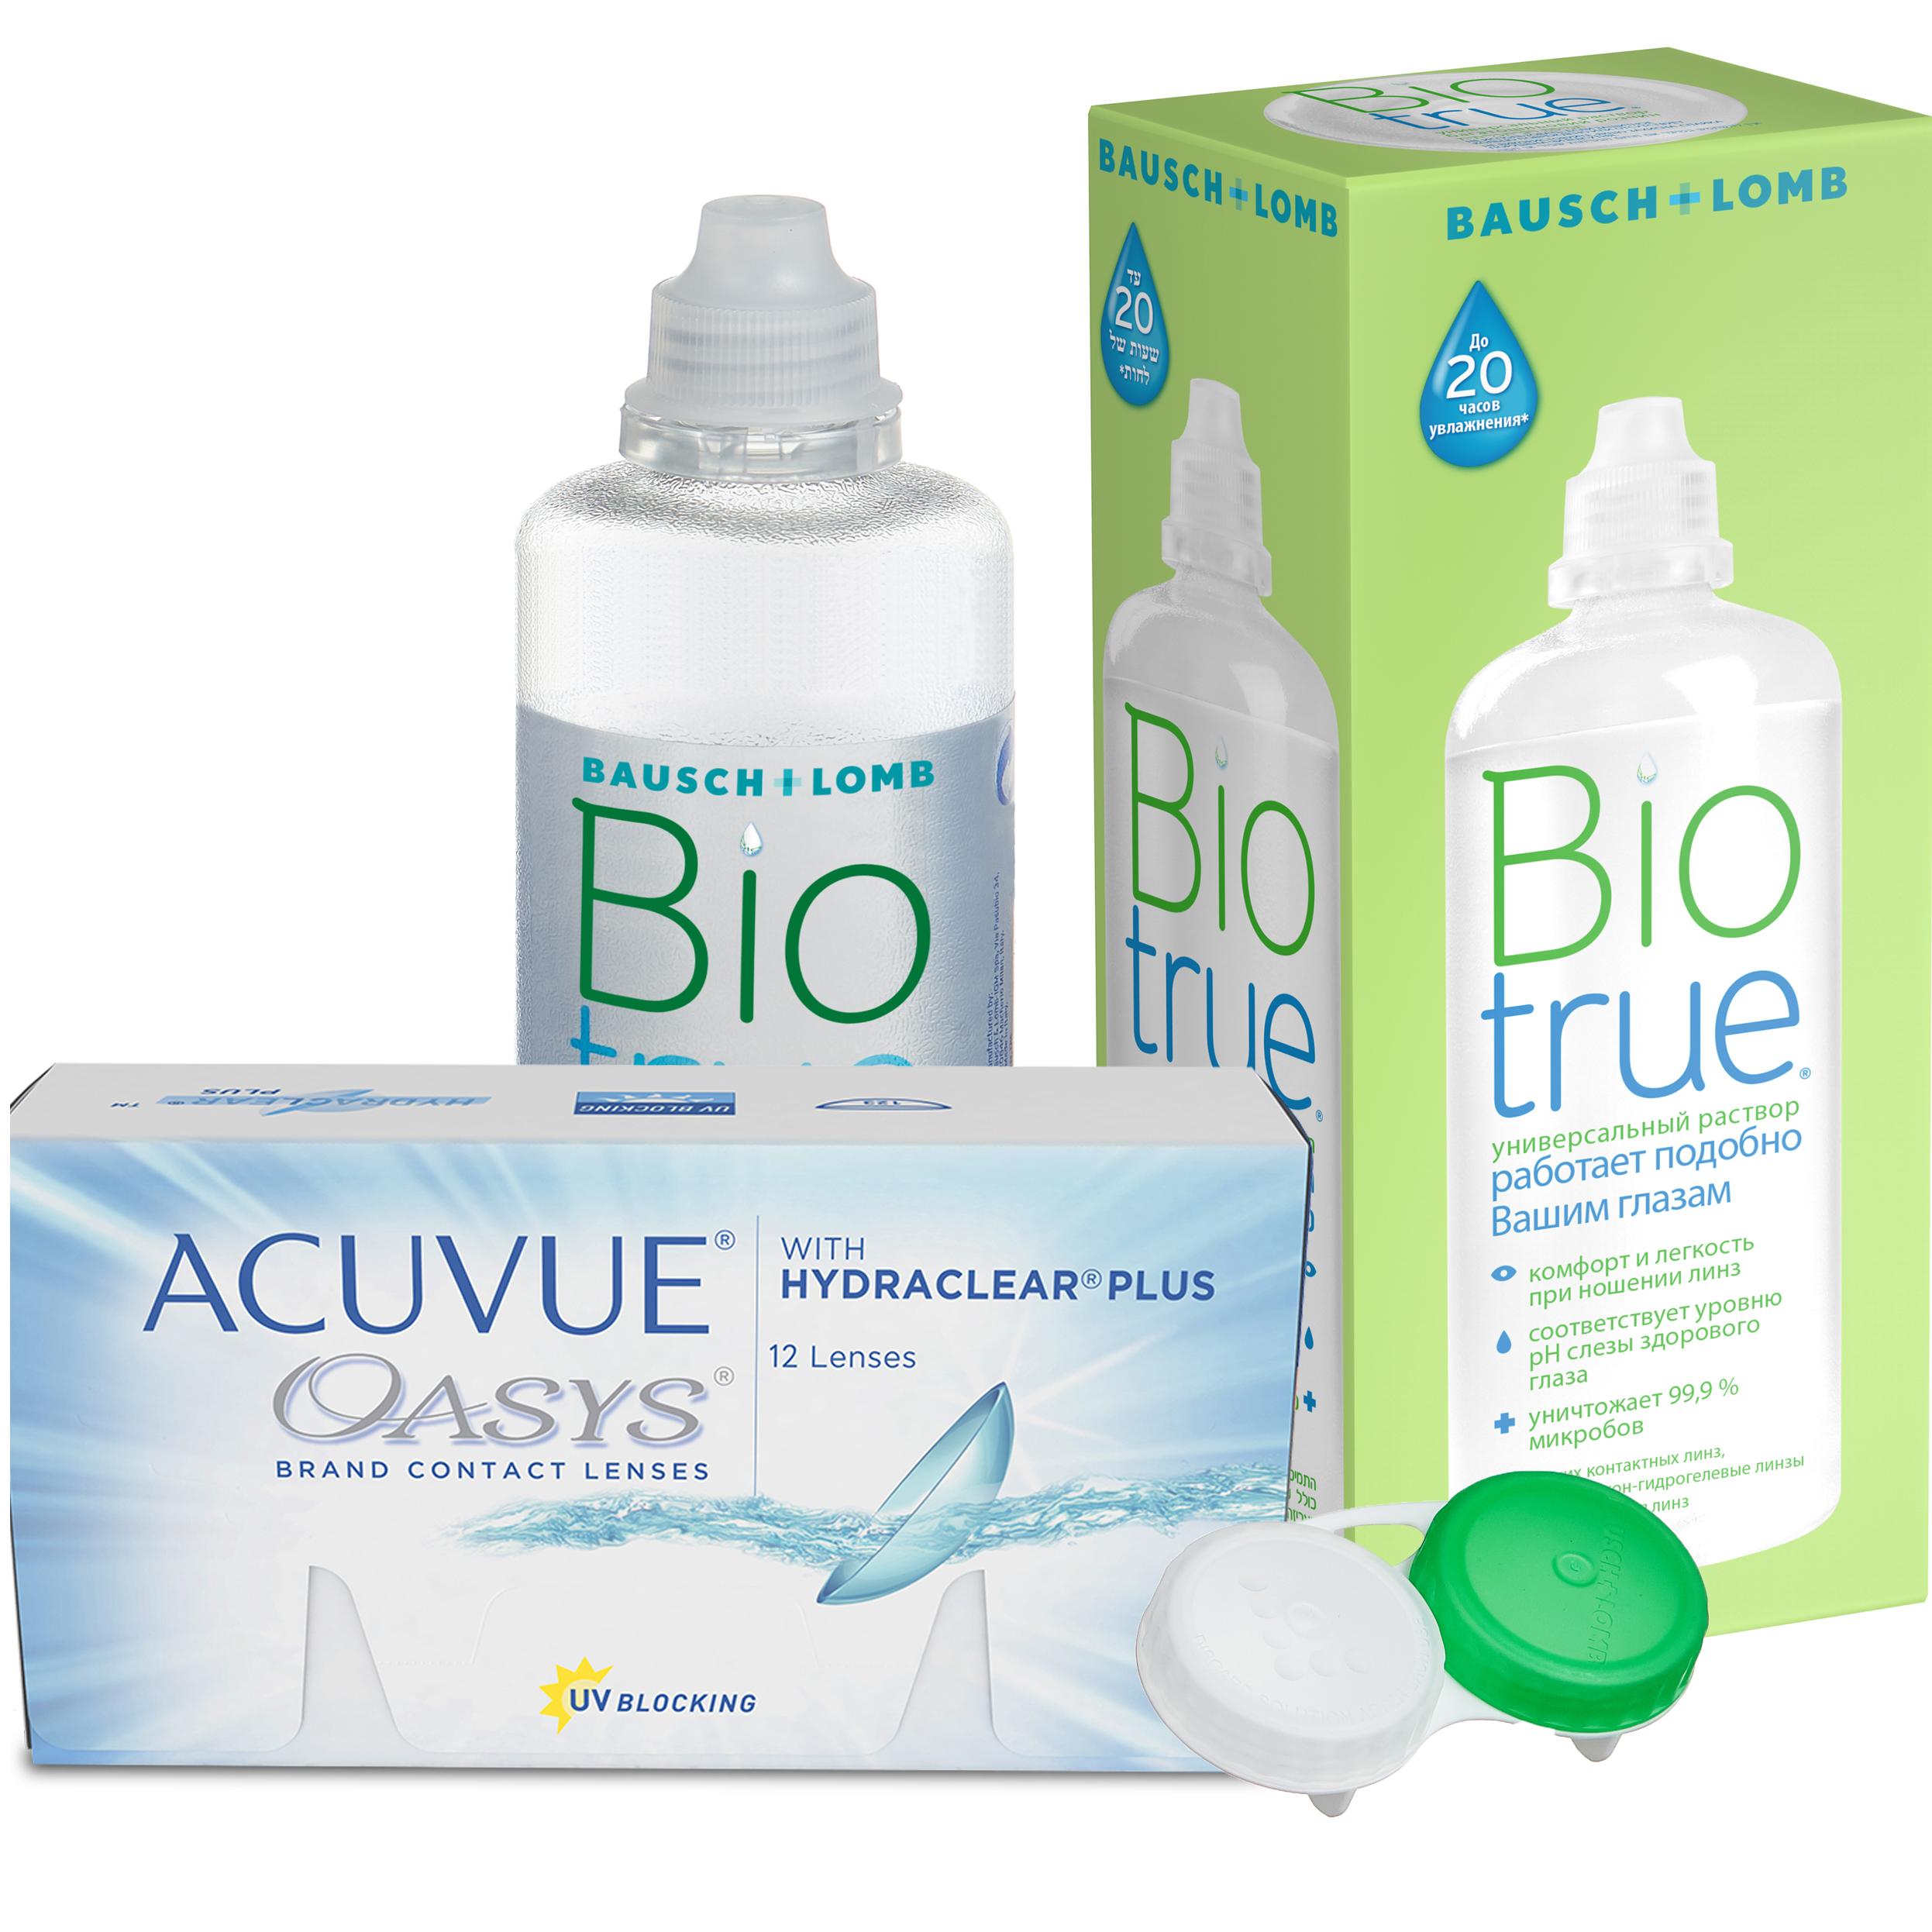 Oasys with Hydraclear Plus 12 линз + Biotrue, Контактные линзы Acuvue Oasys with Hydraclear Plus 12 линз R 8.8 -6, 50 + Biotrue 300 мл  - купить со скидкой